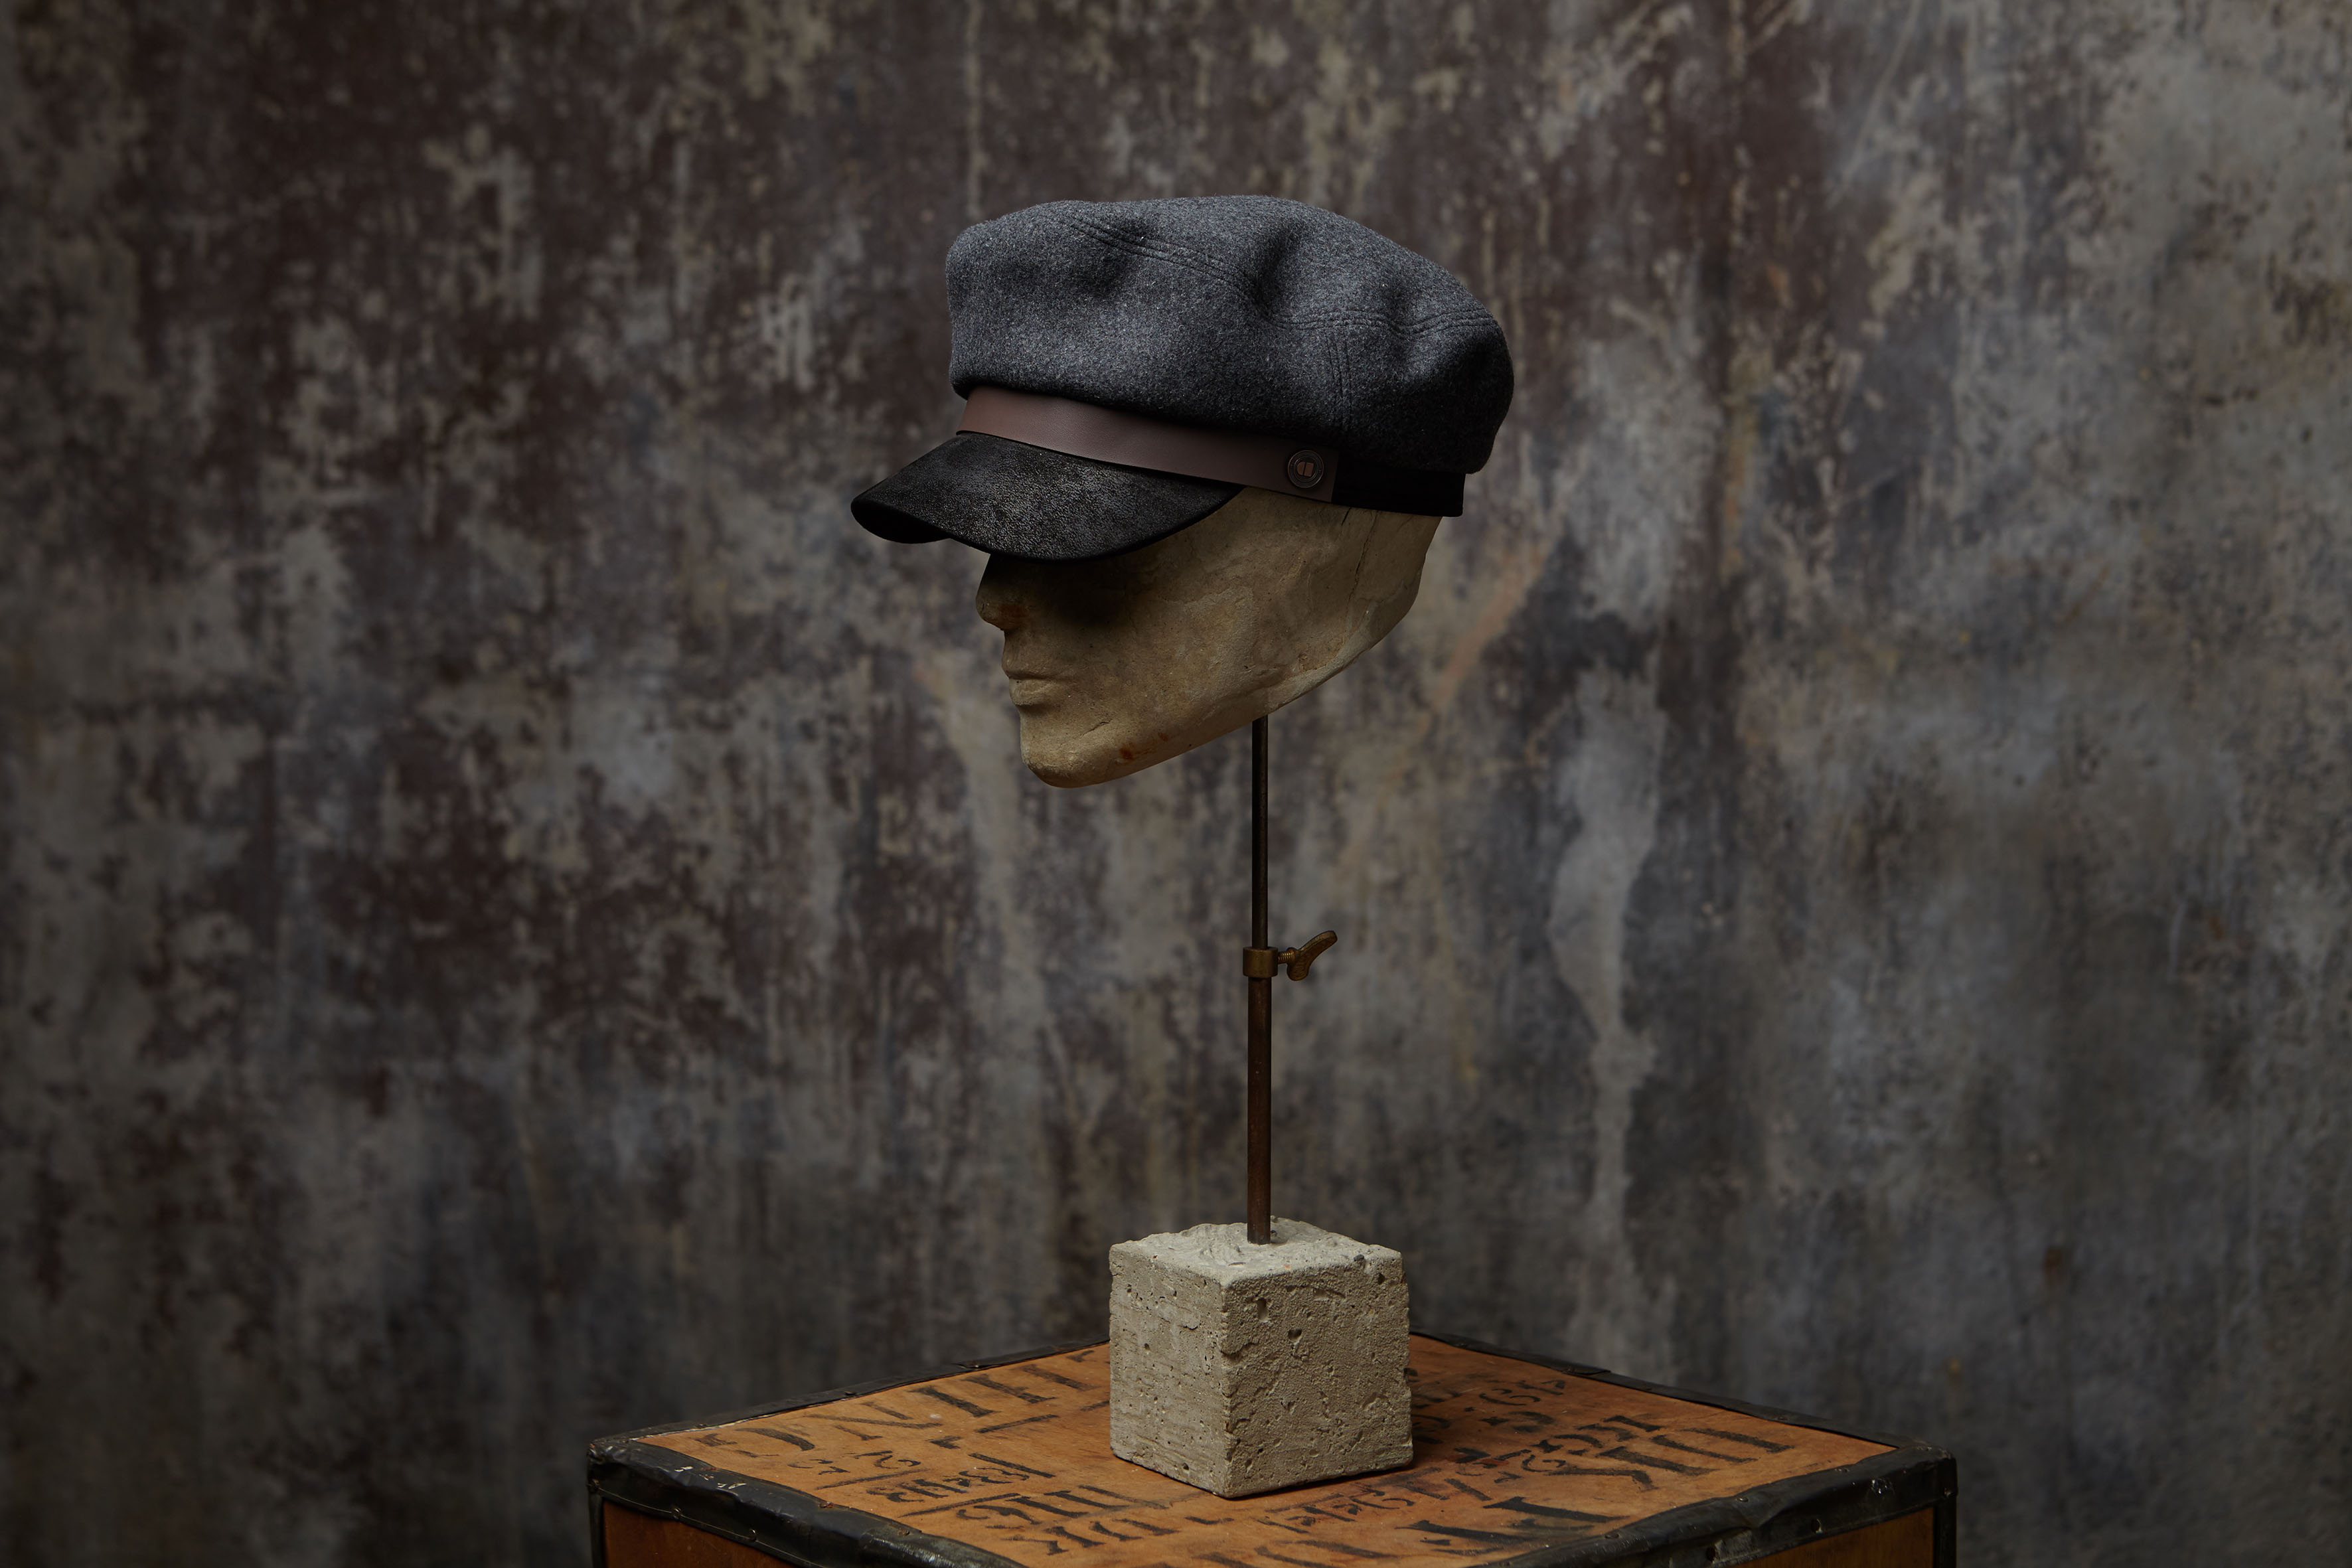 Jake Spitfire Brando Winter Wool Cap With Leather Peak